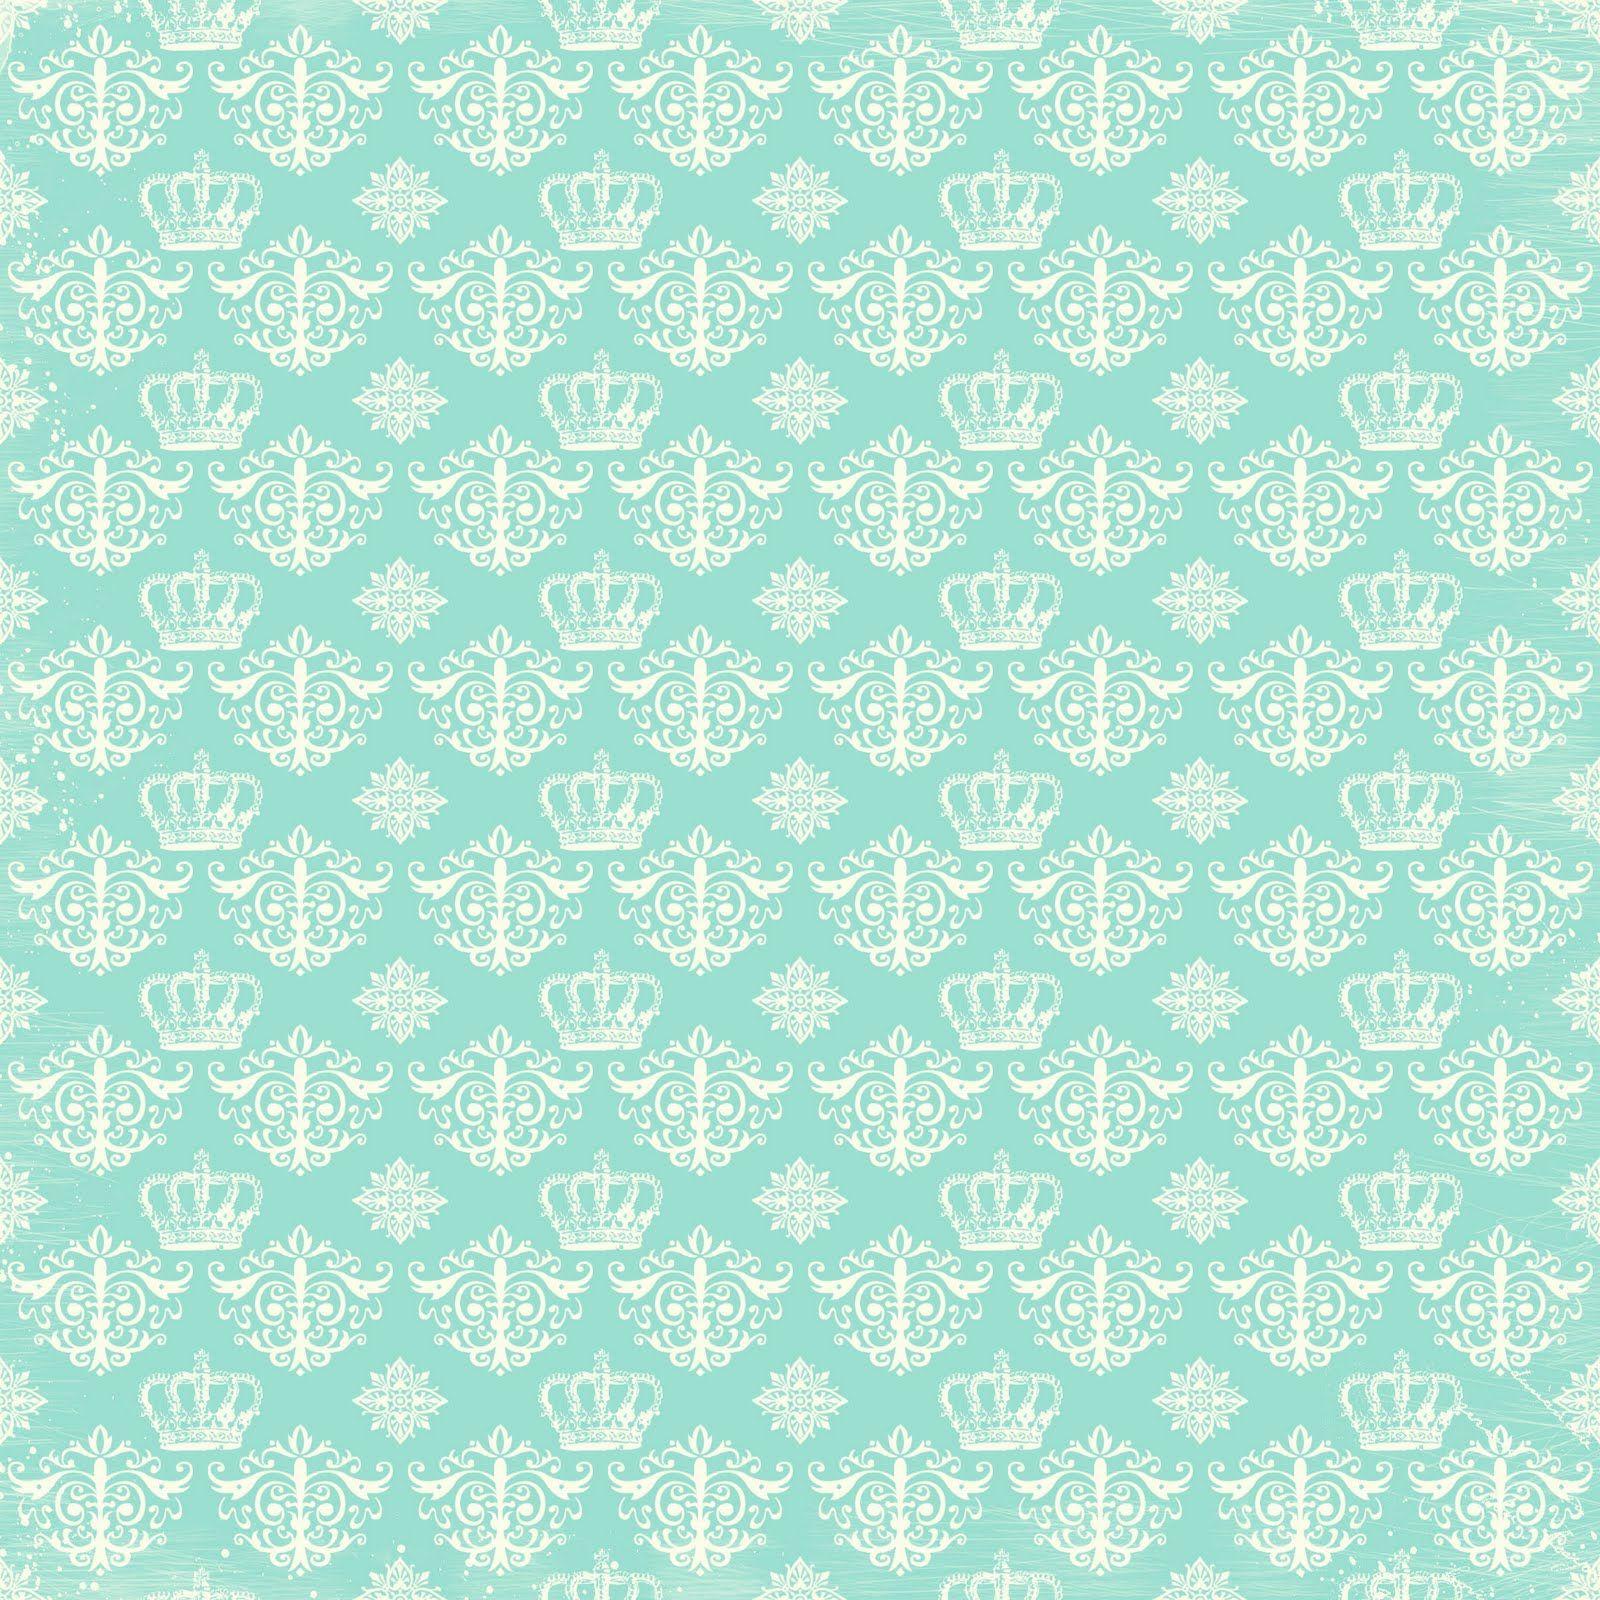 Scrapbook paper as wallpaper - Shabby